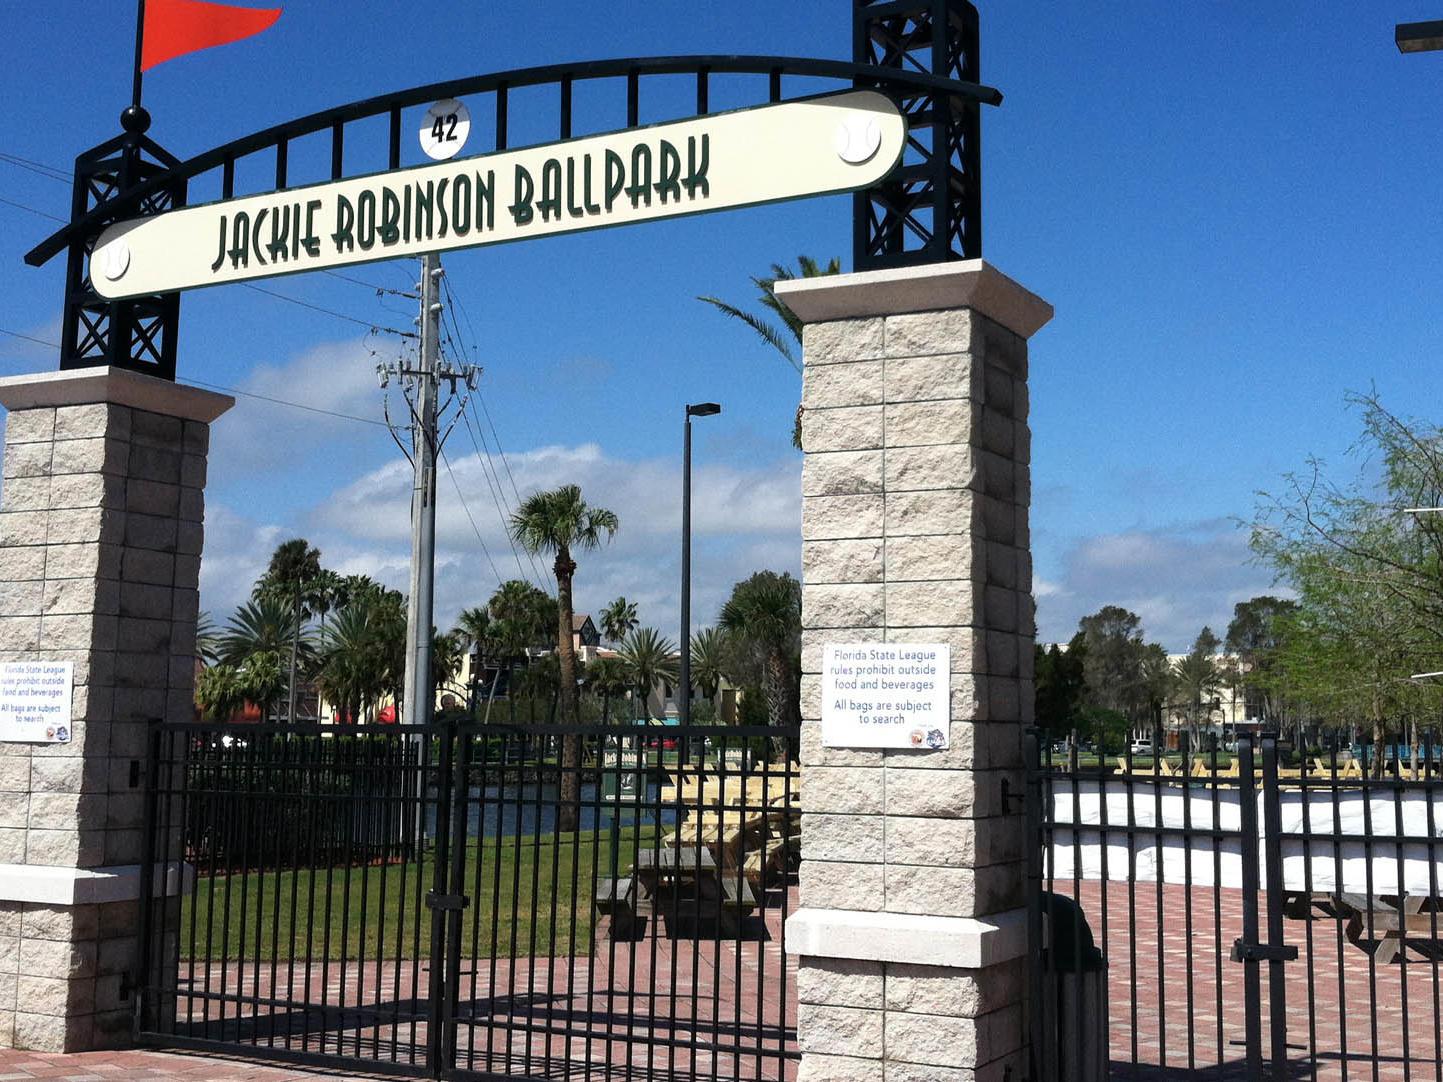 jackie robinson ballpark entrance